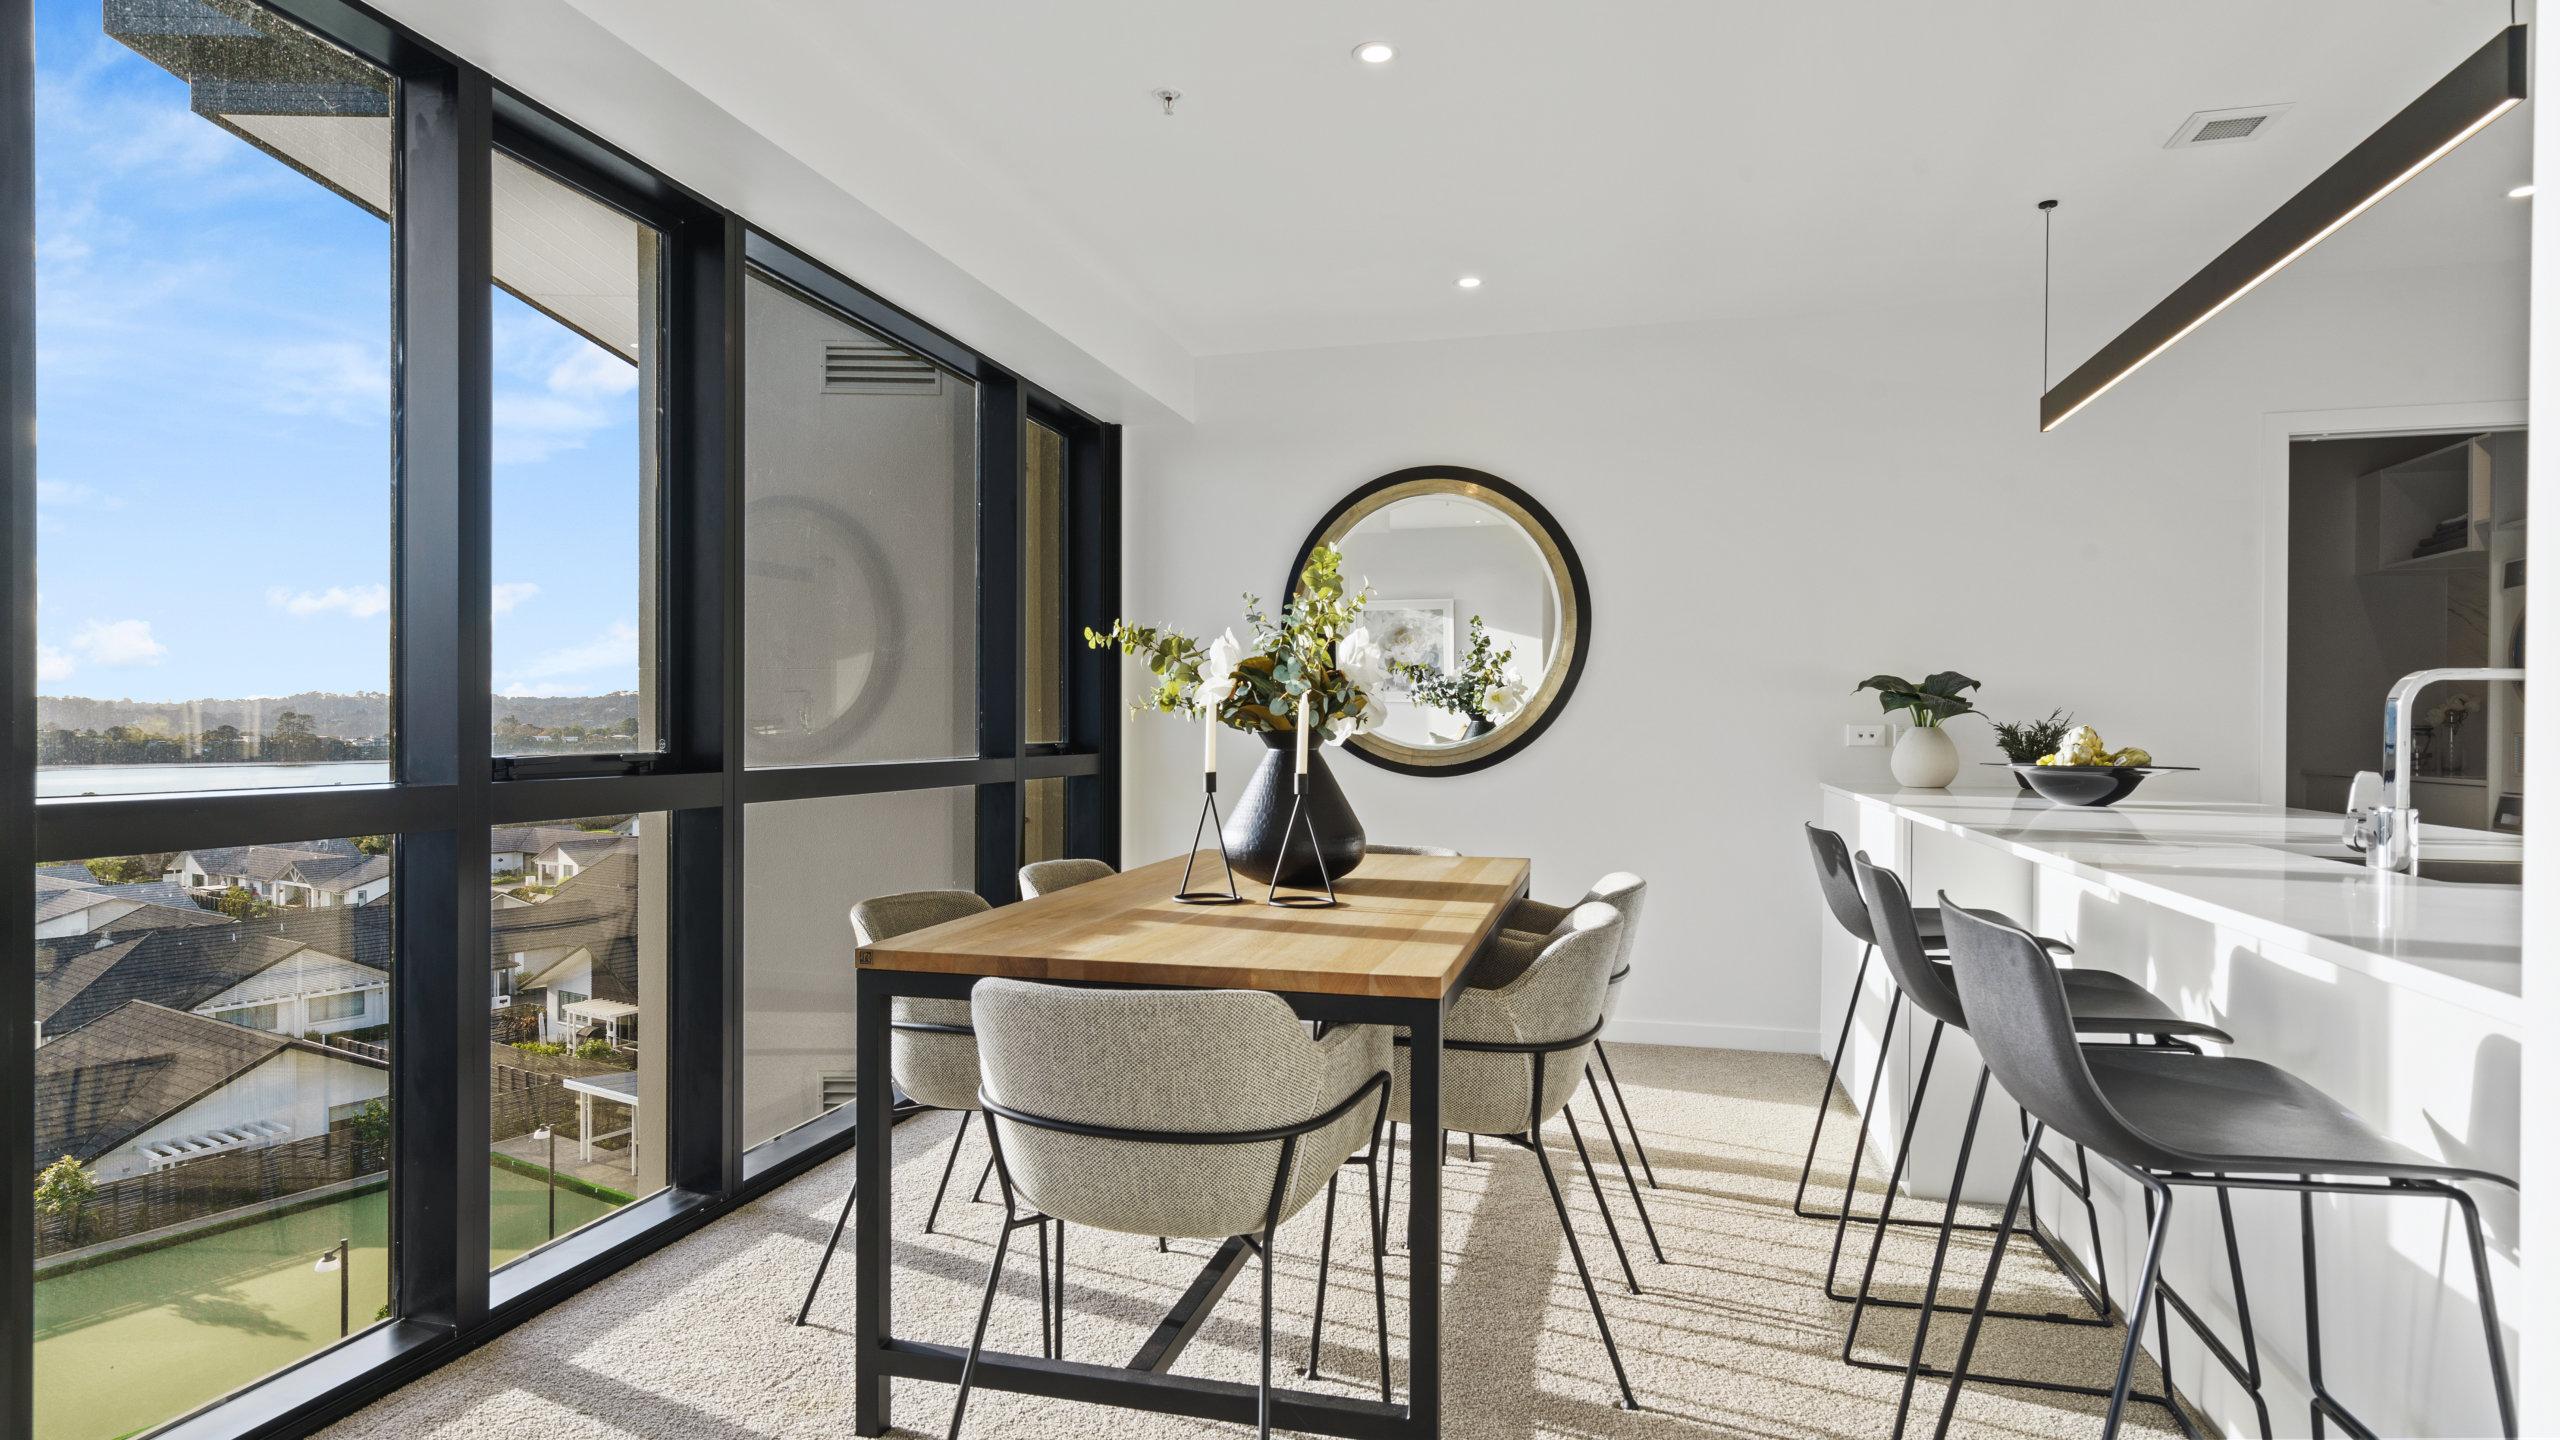 Waterford retirement village luxury apartment kitchen dining area